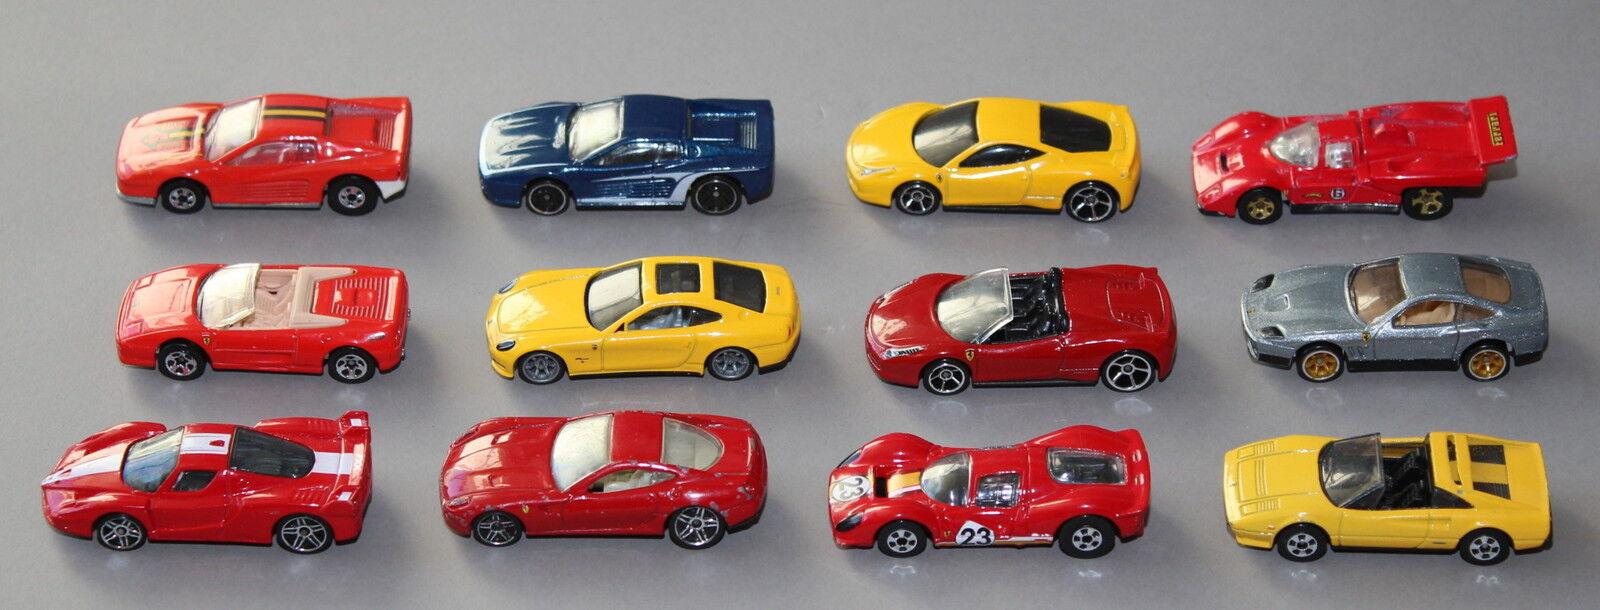 12x ferrari coche modelo o. OVP, 11 unidades de mattel Hot Wheels 1 64 -. - (317)